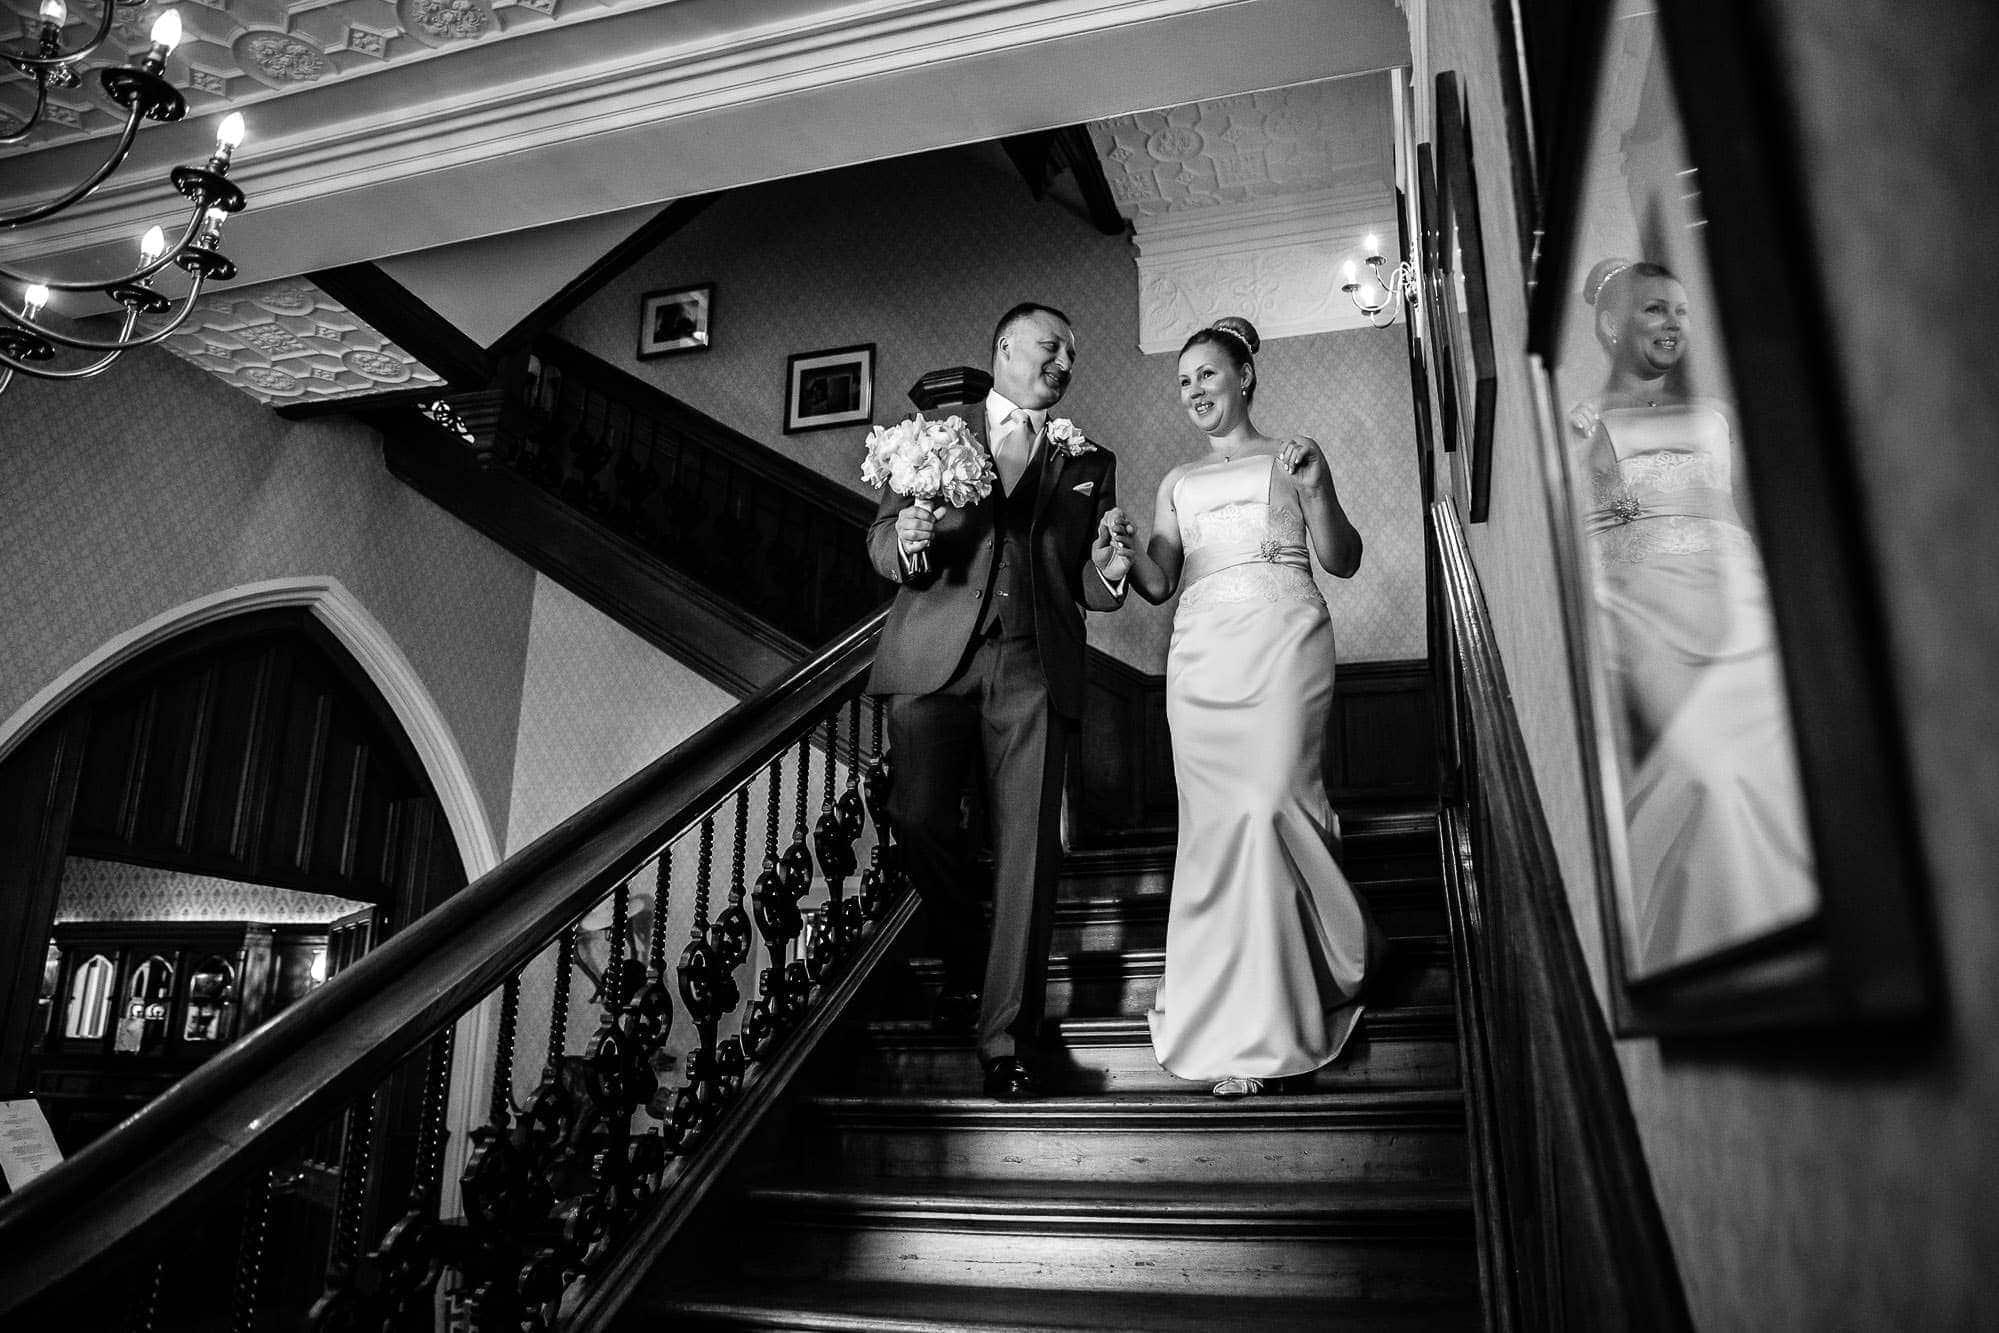 Bride & Groom walking down stairs at Oakley Court Wedding